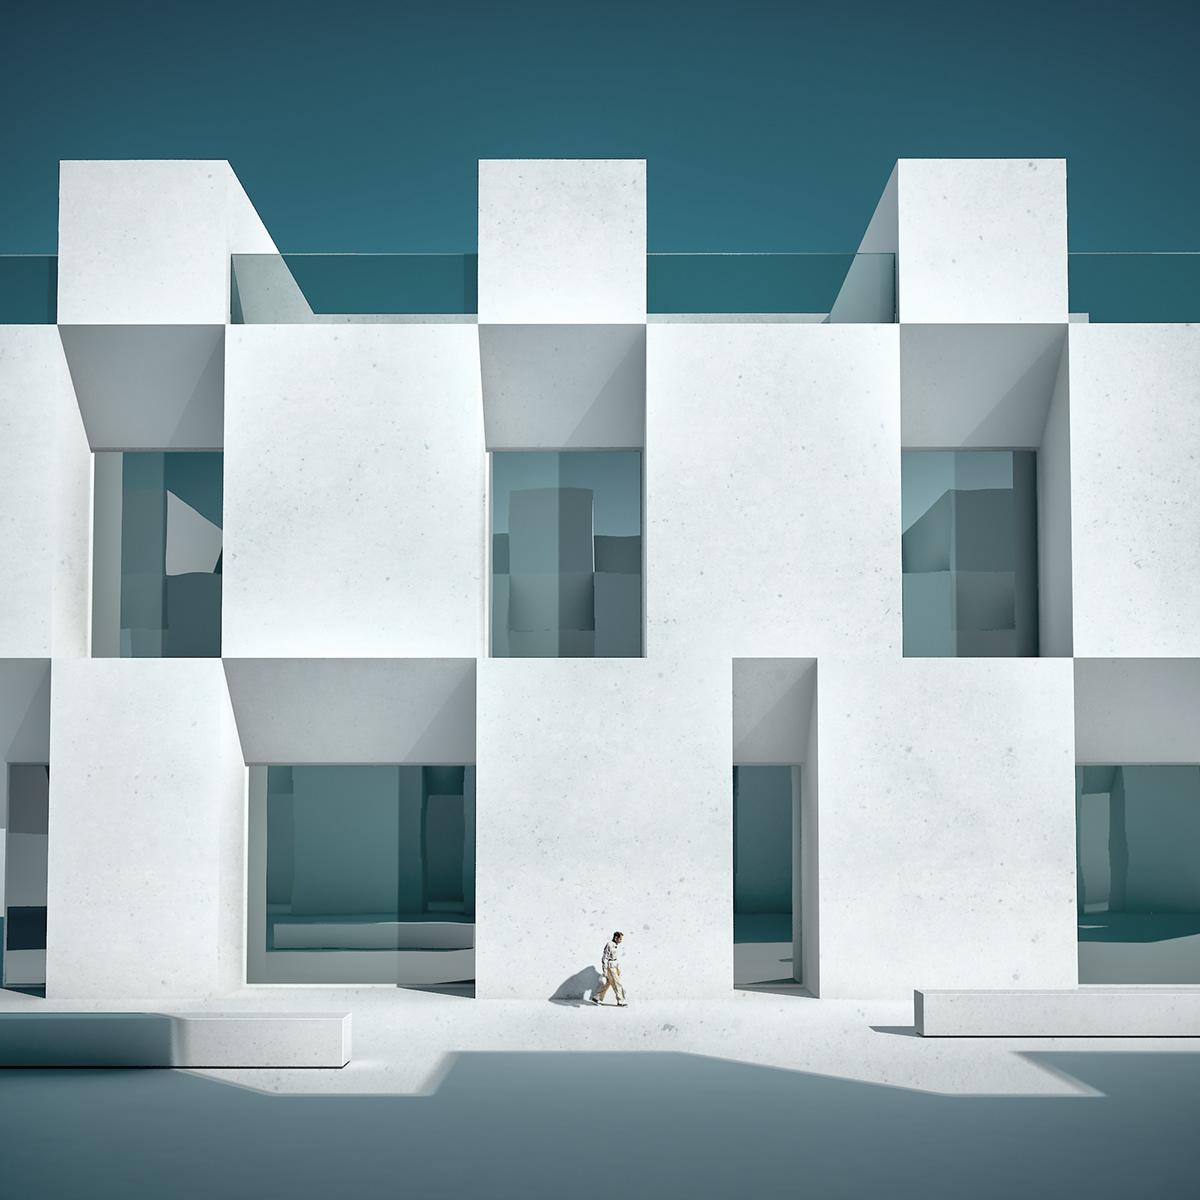 Architecture Minimalist Photography